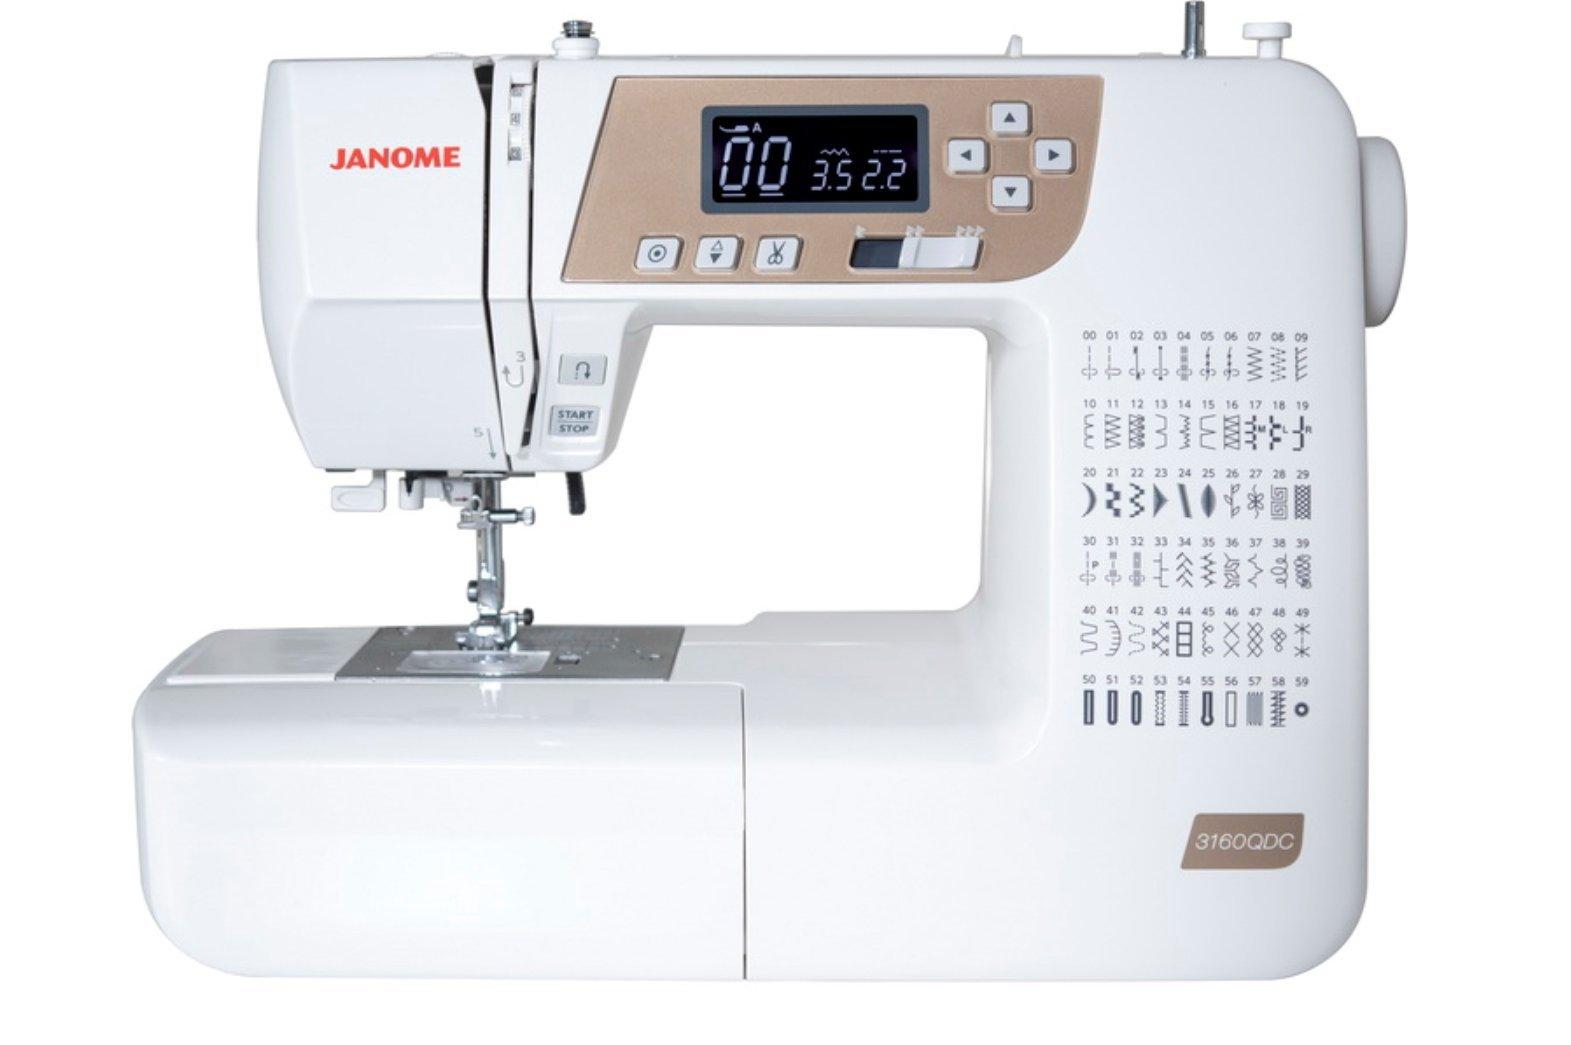 Janome 3160 QDC-T